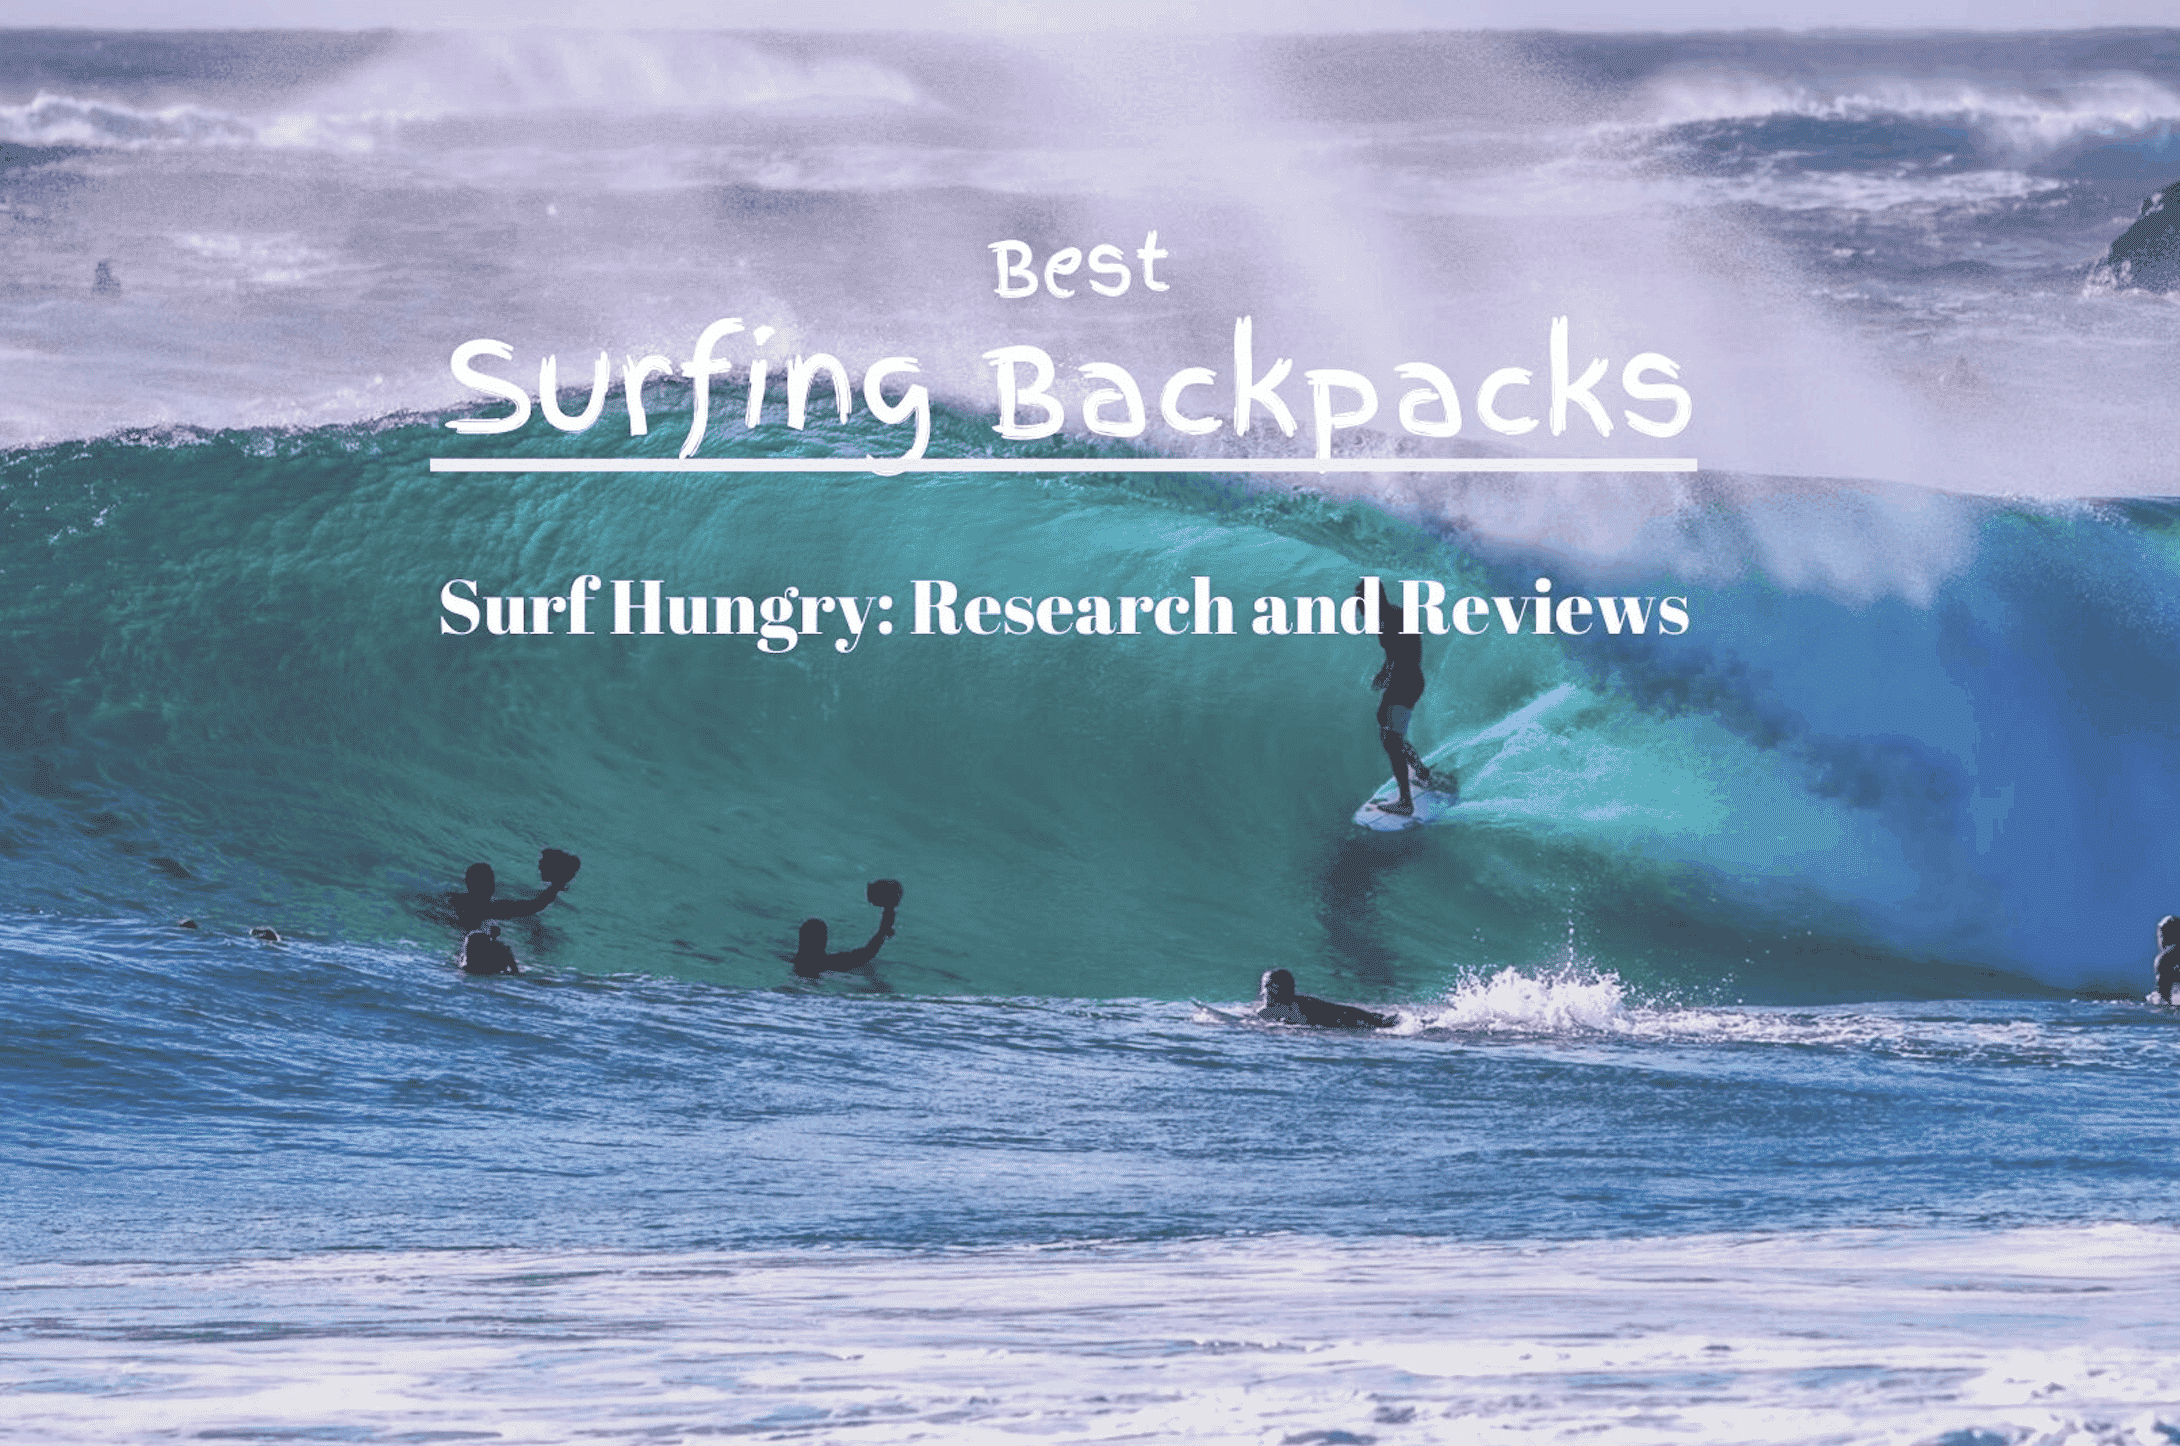 best surfing backpacks